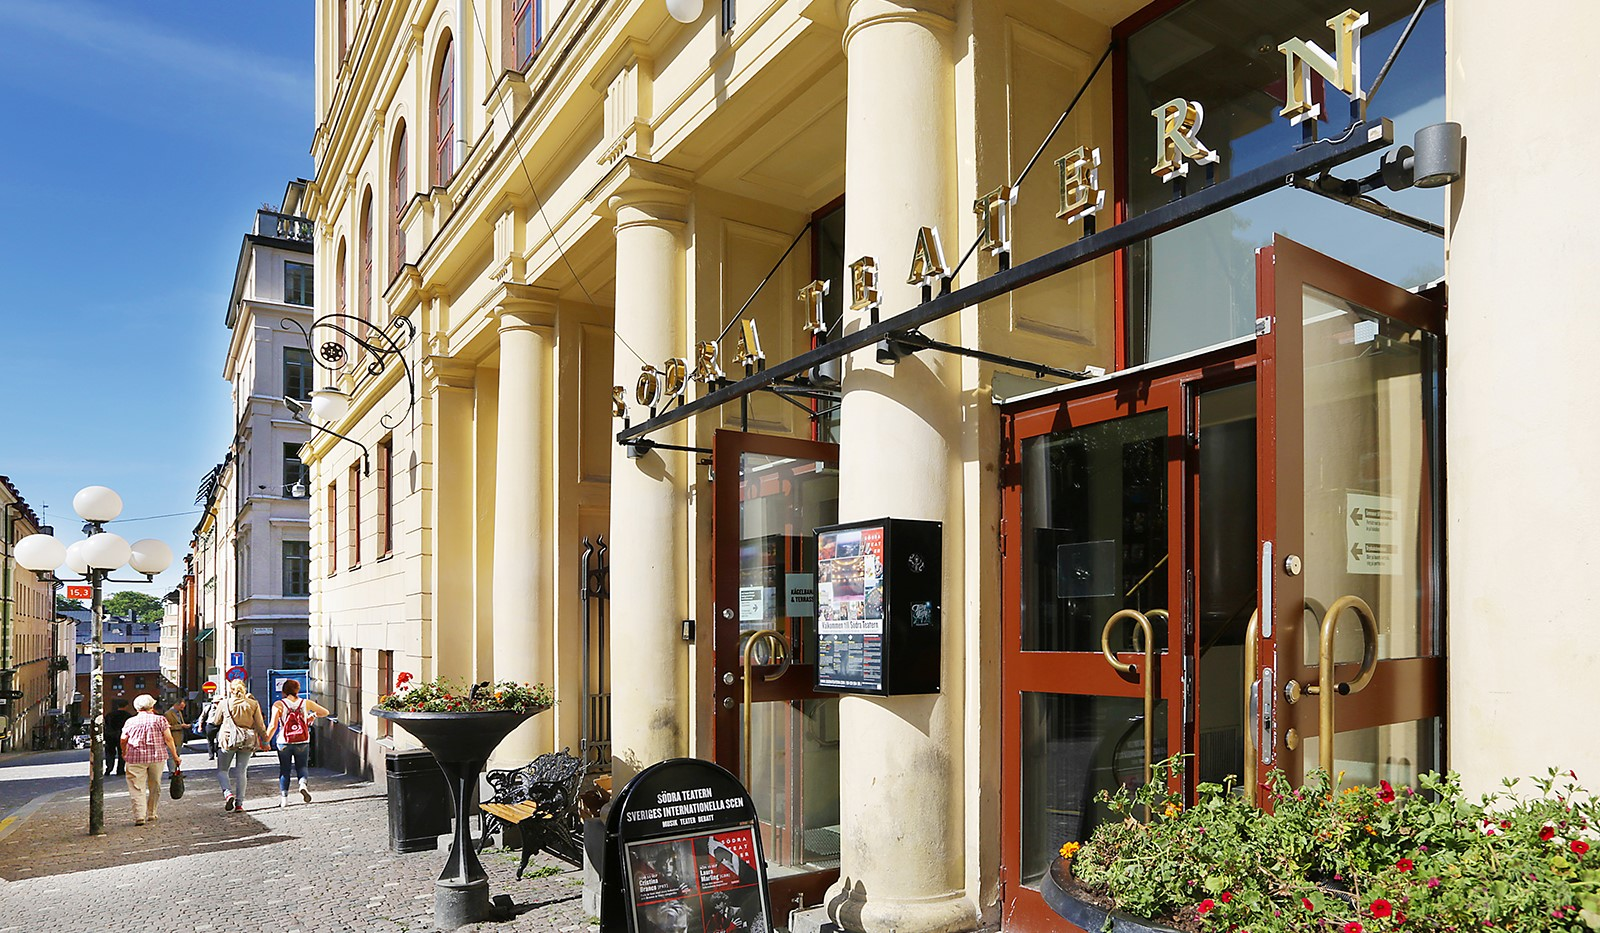 Götgatan 26 - Södra teatern